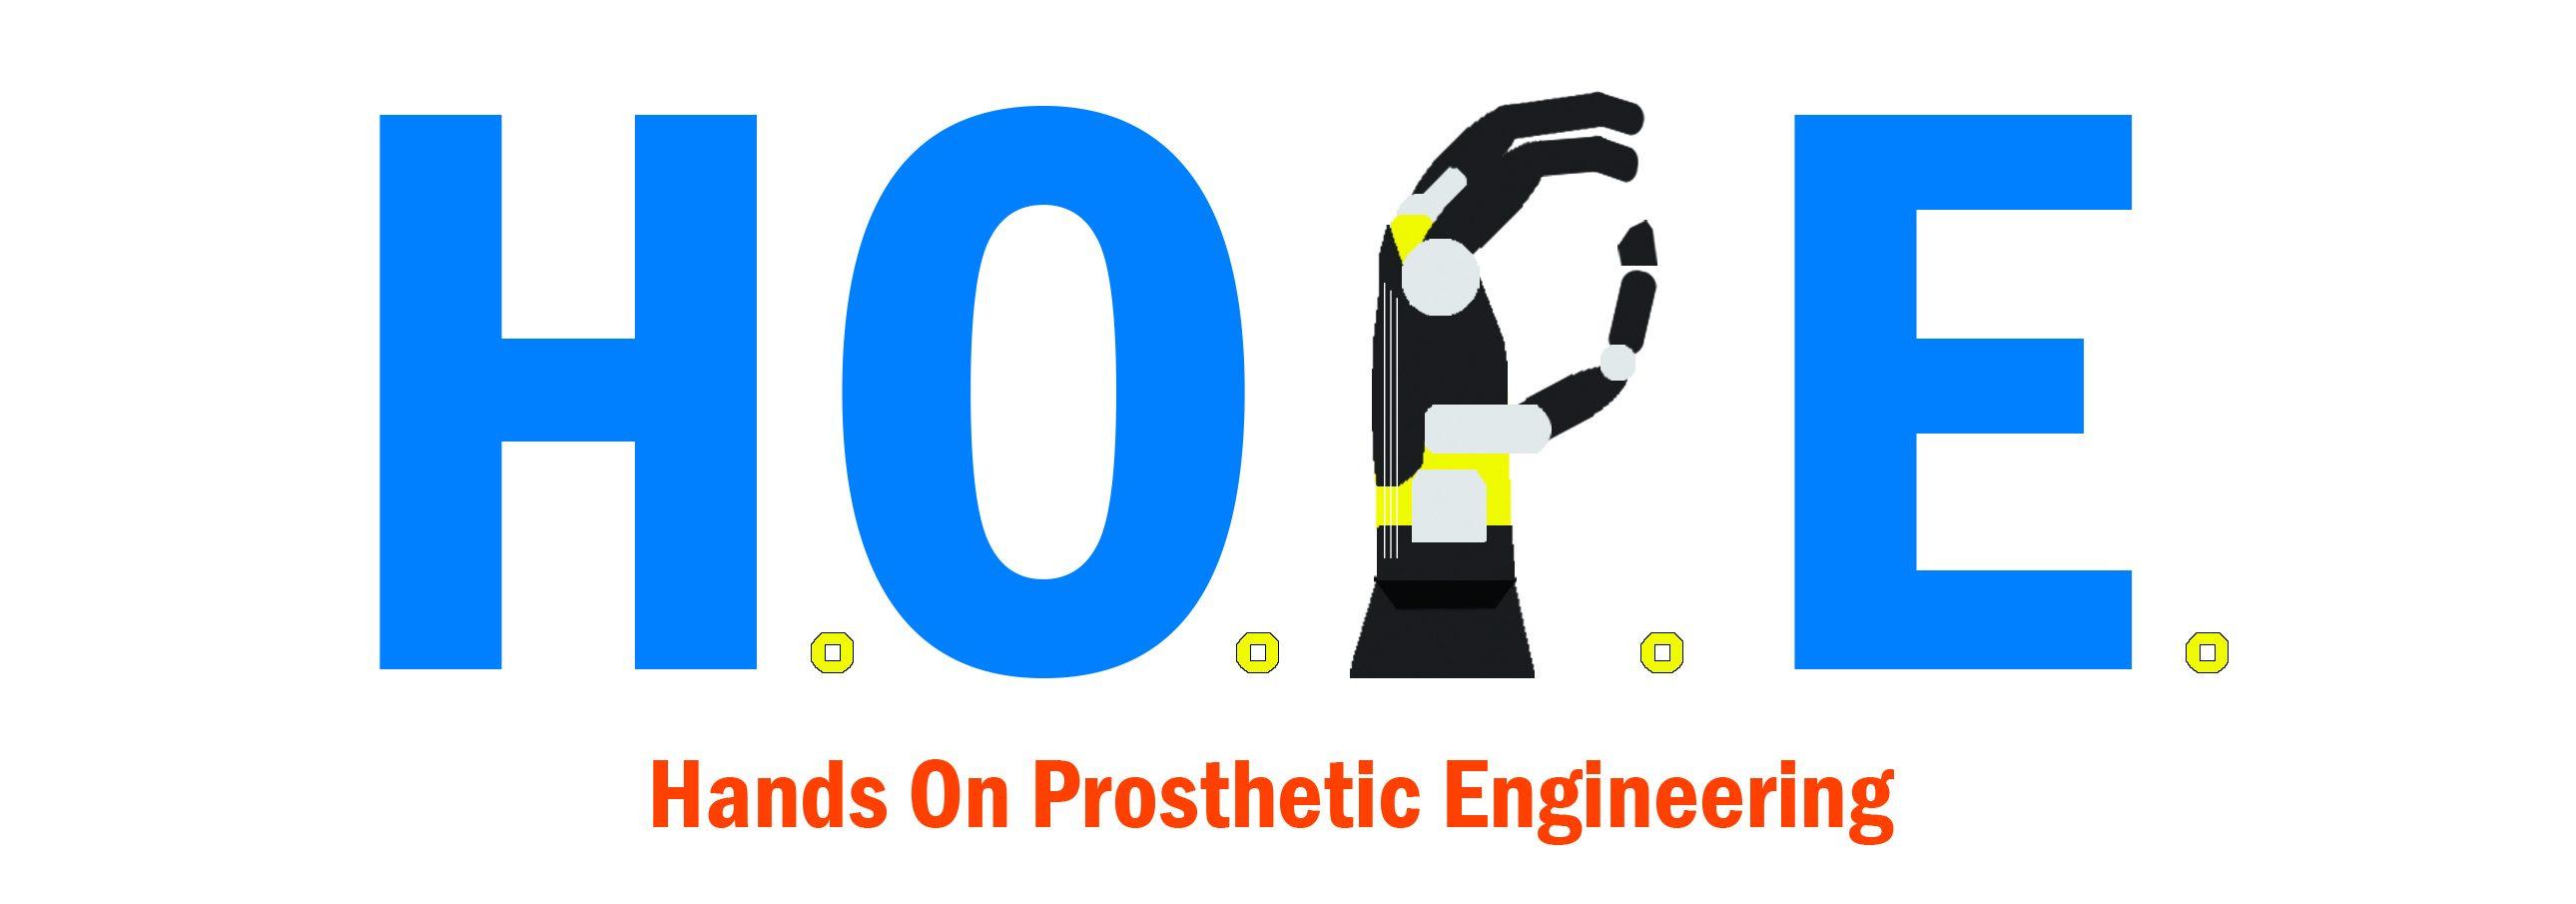 Hands on Prosthetic Engineering